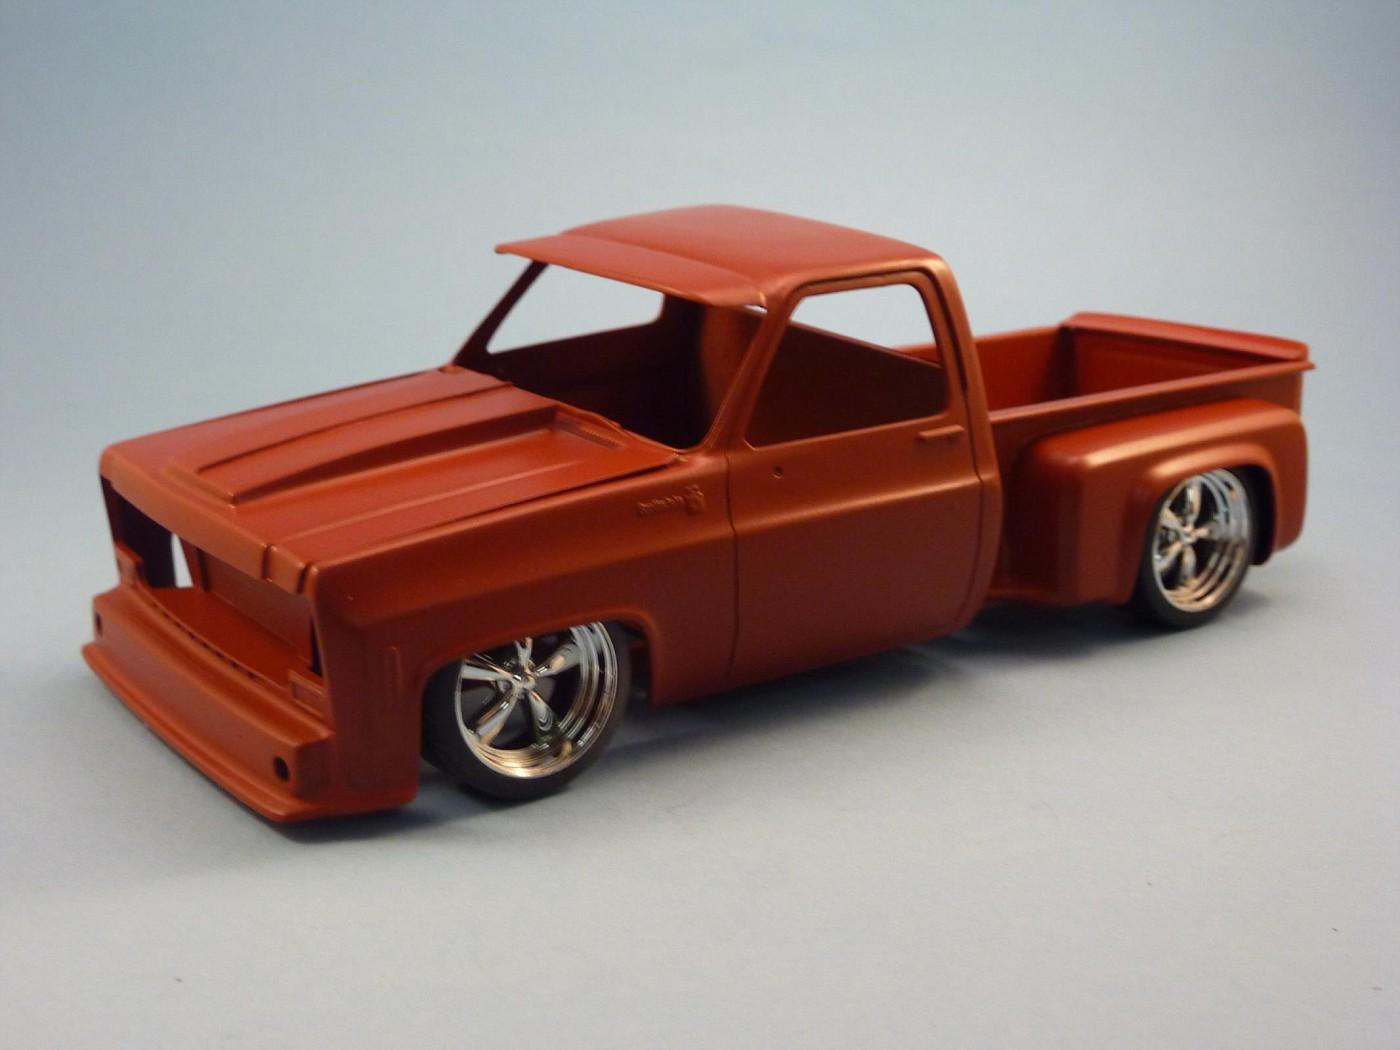 Chevrolet C 10 Pickup [Terminé] - Page 2 Photo5-vi